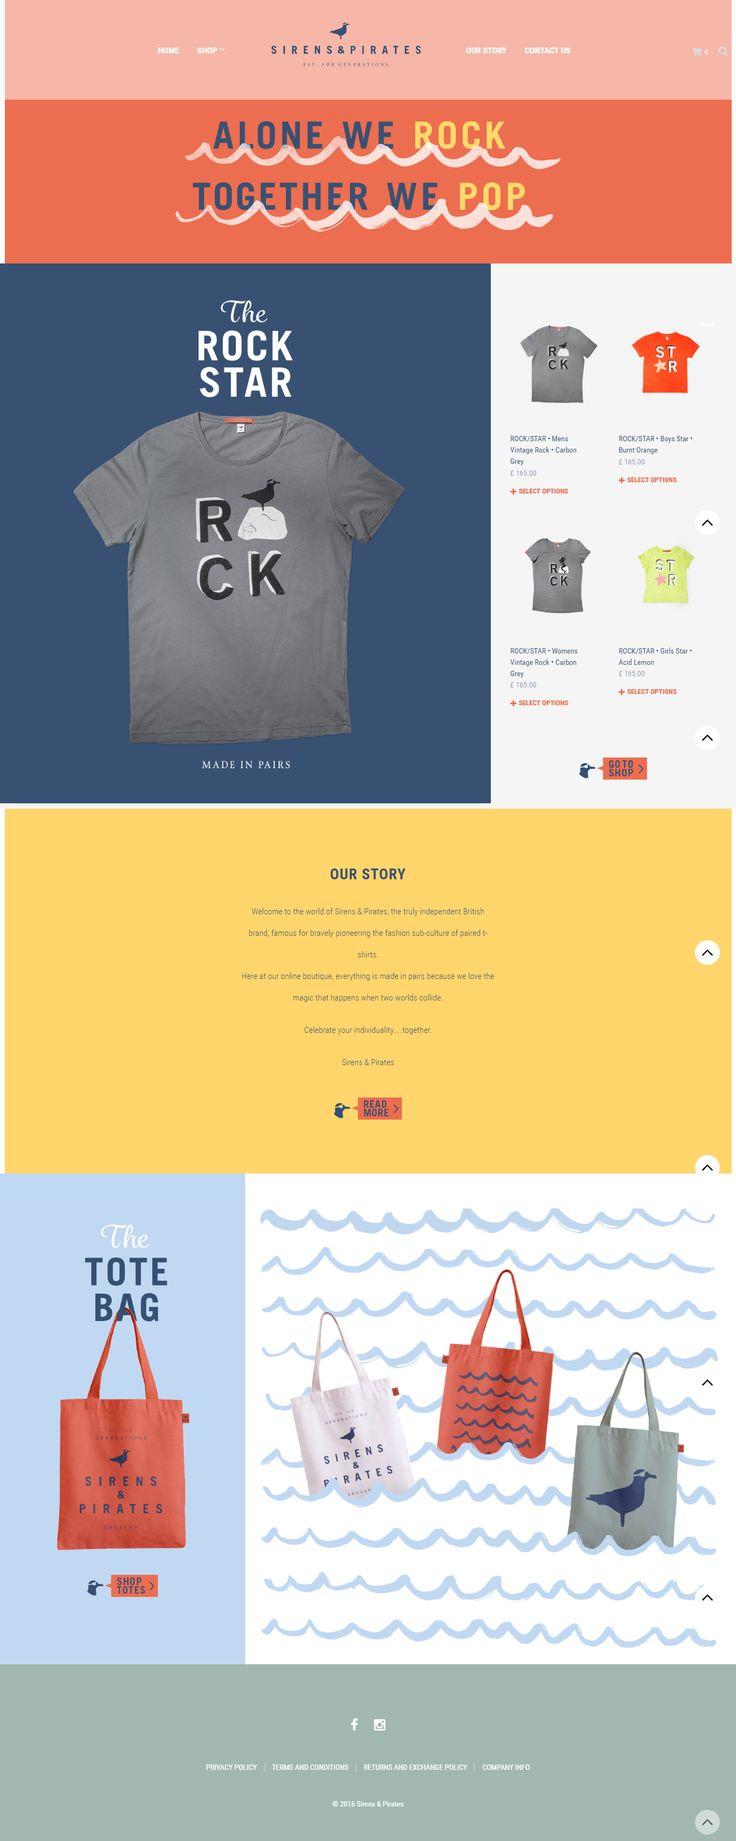 Lovely & playful site powered by Shopkeeper WP Theme: sirensandpirates.com/wordpress/ #webdesign #wordpress #design #templates #themes #wordpressthemes #minimalism #typography http://themeforest.net/item/shopkeeper-responsive-wordpress-theme/9553045?&utm_source=pinterest.com&utm_medium=social&utm_content=sirens-pirates&utm_campaign=showcase